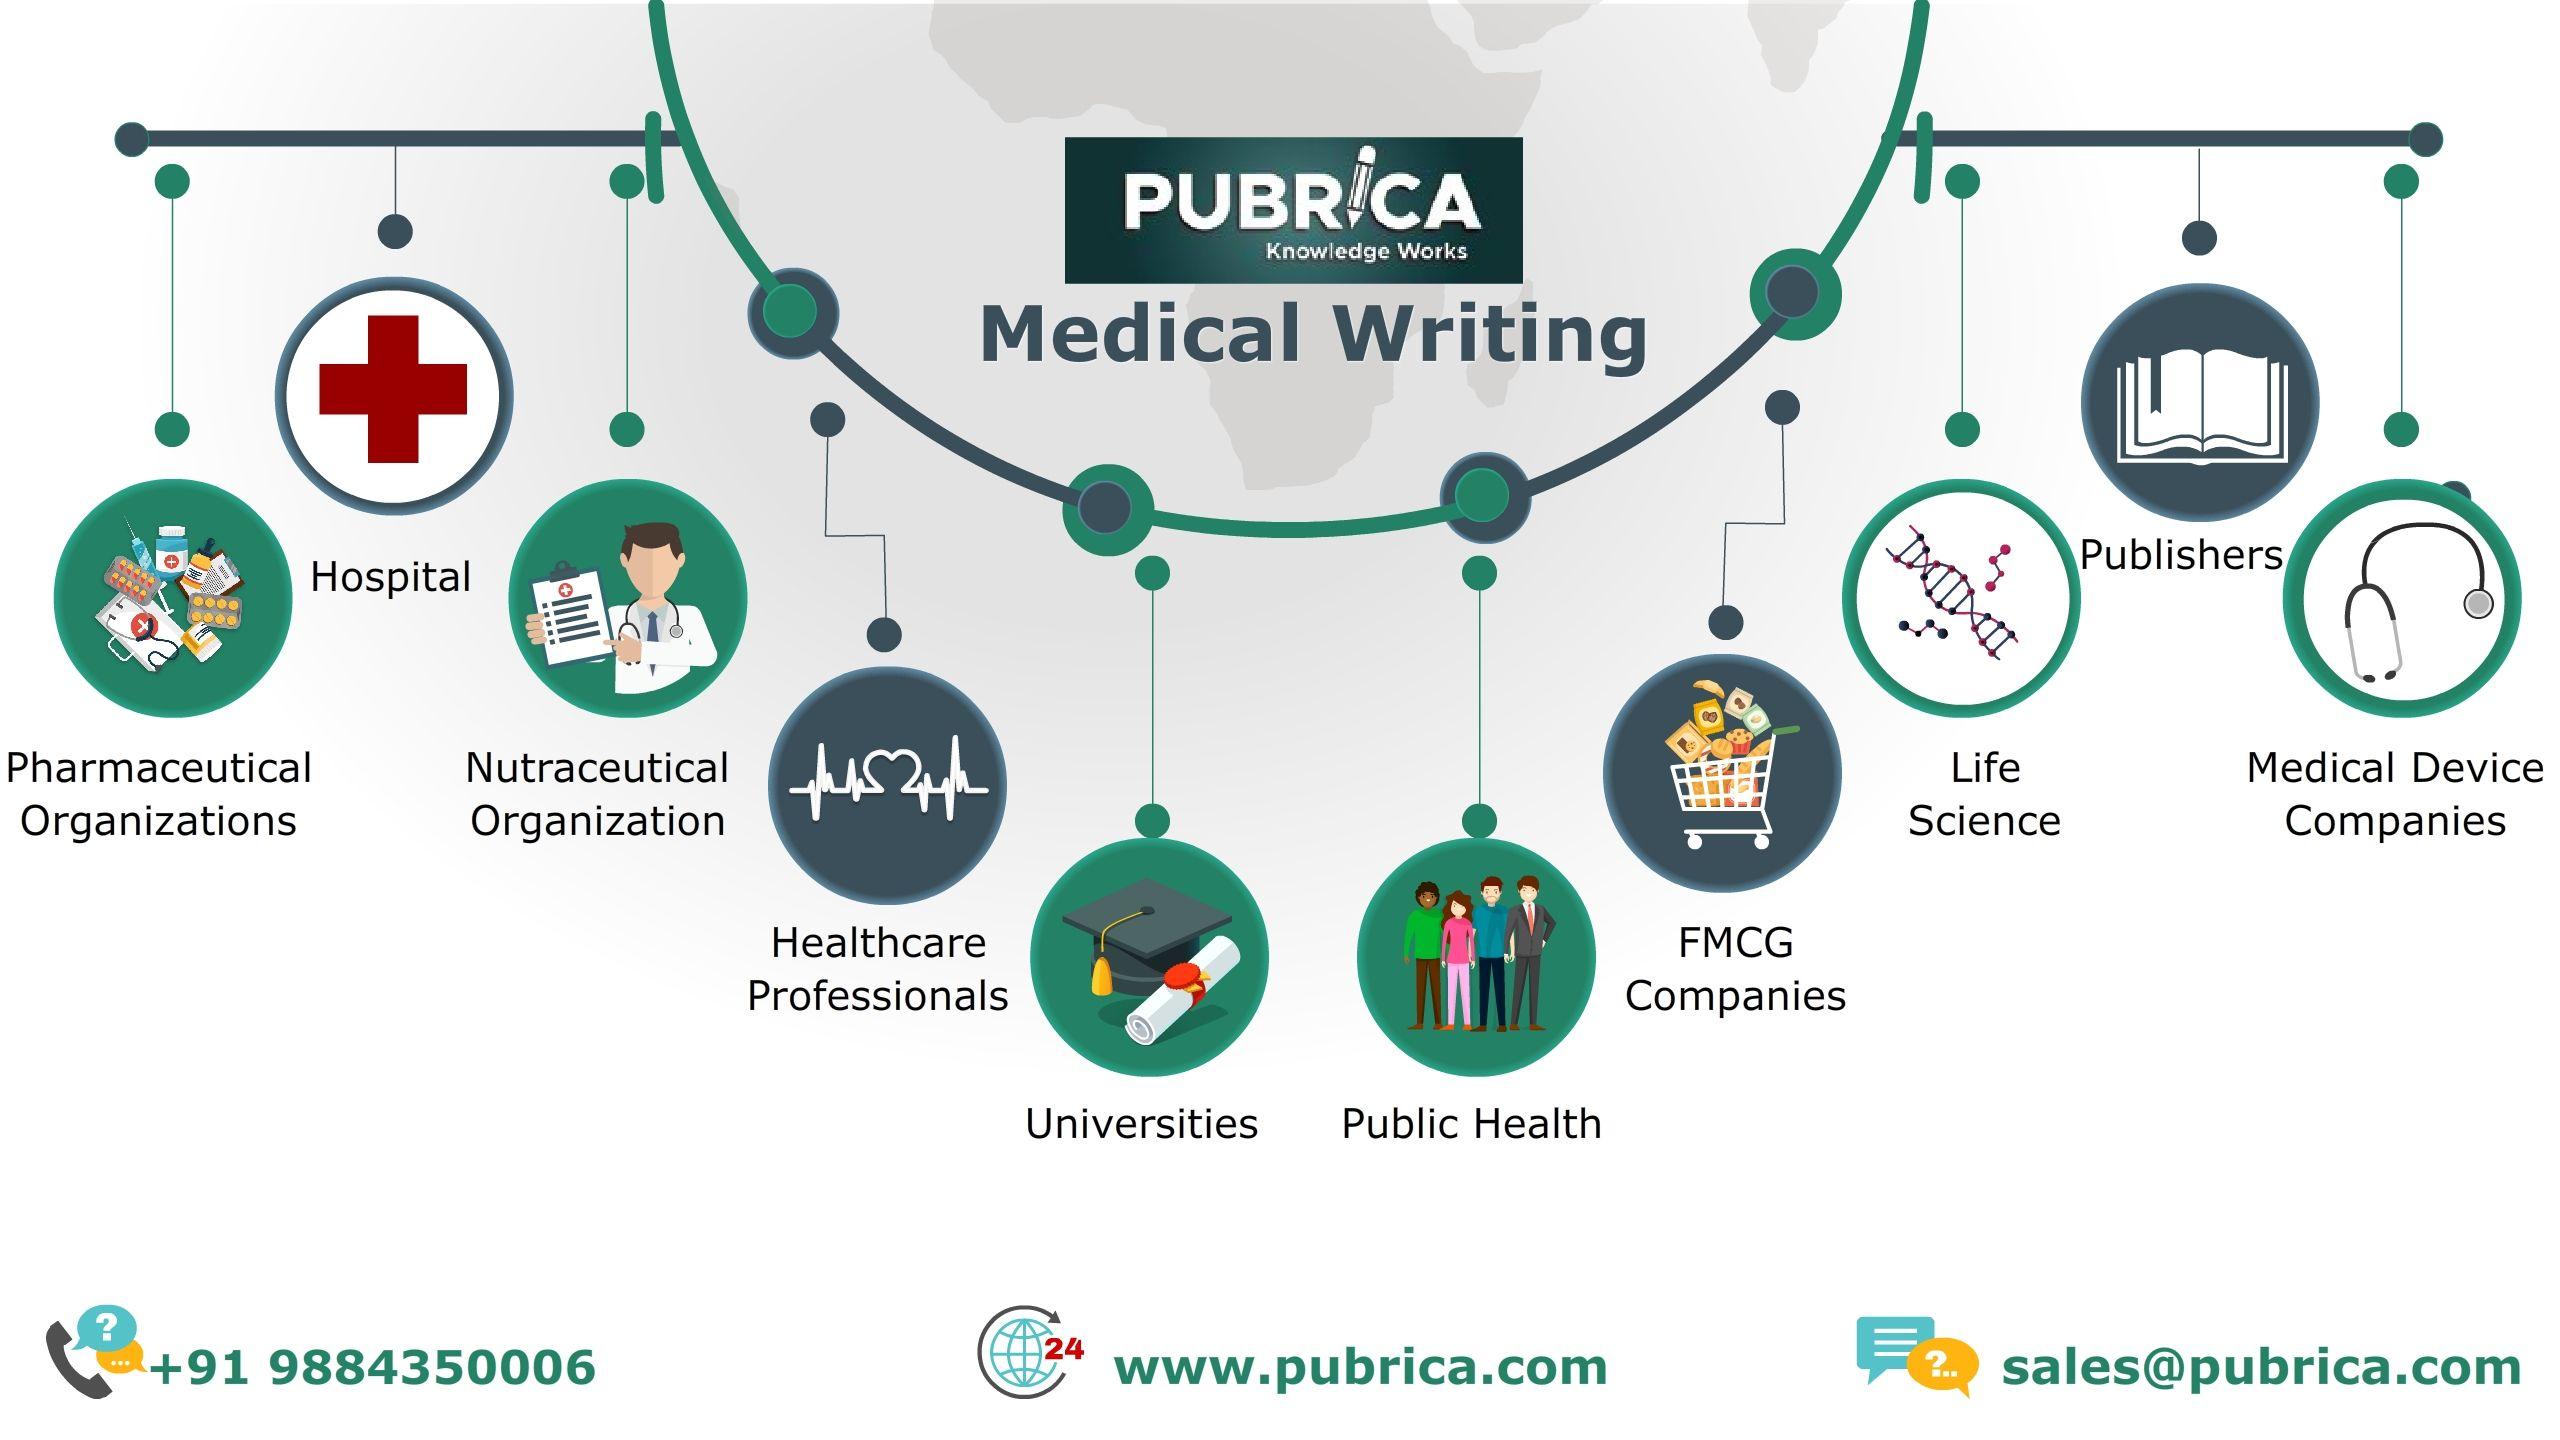 Scientific writing services company